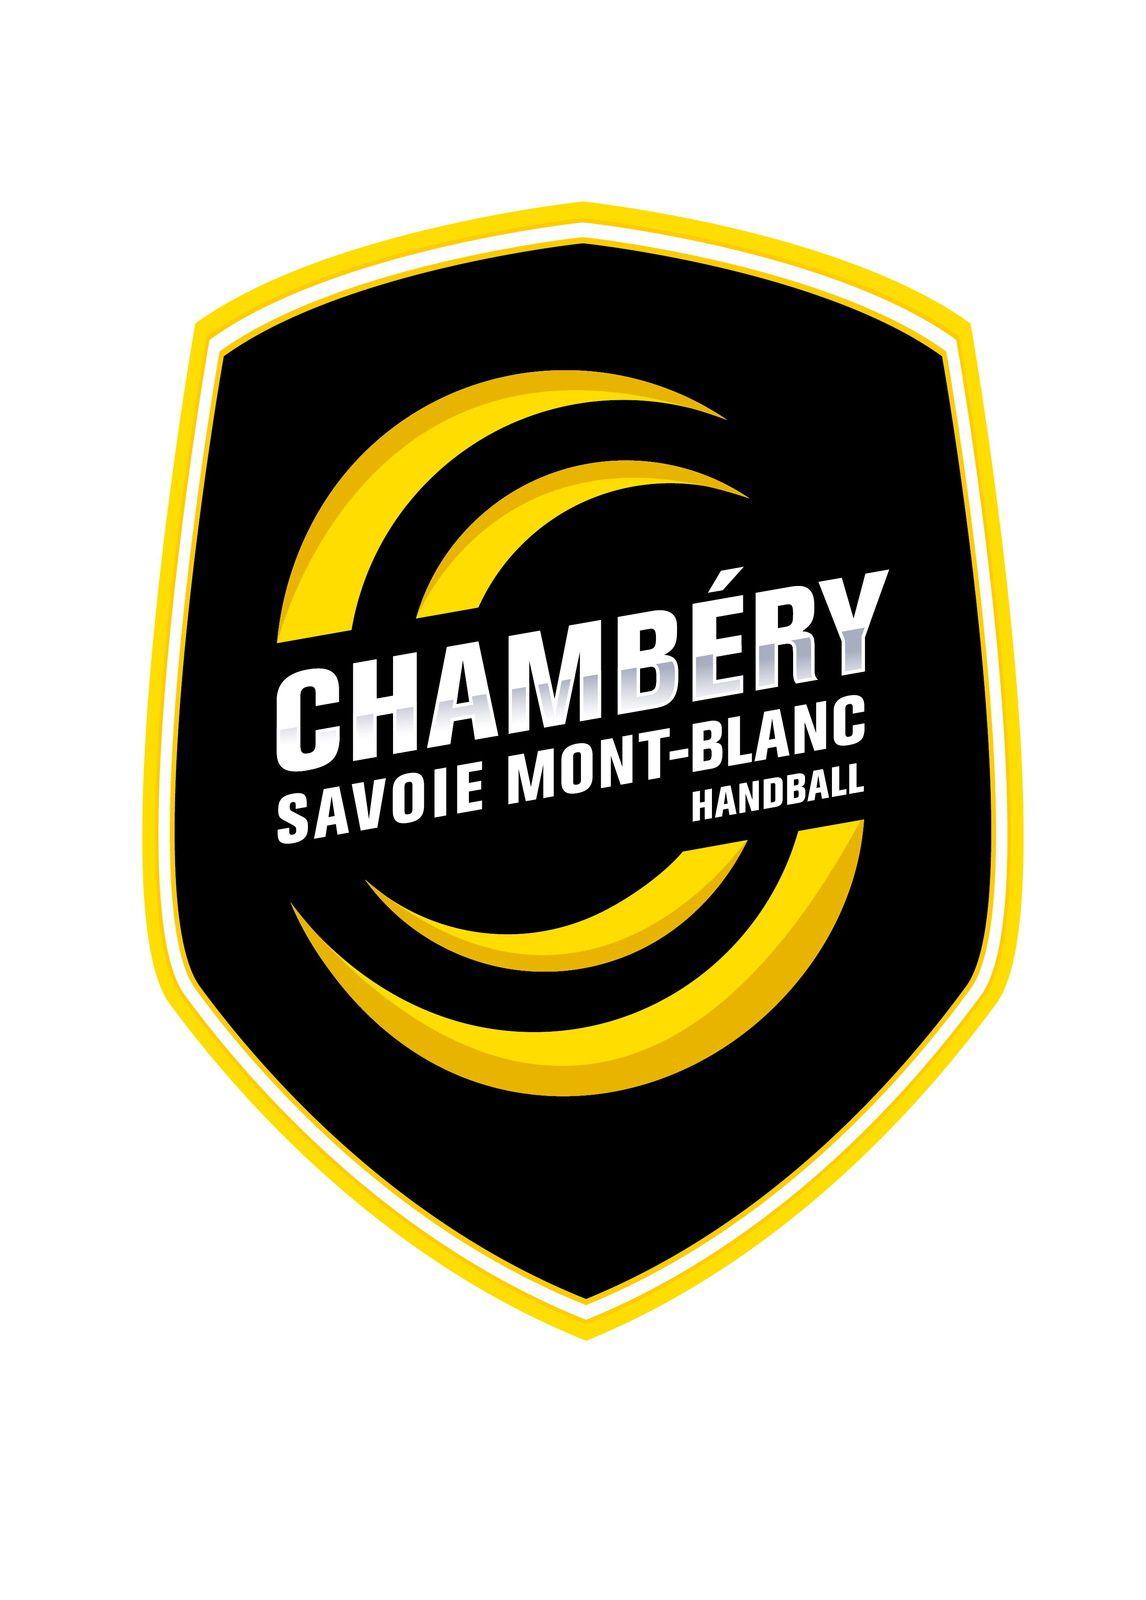 N1 la jeunesse de CHAMBERY2 fait tomber BELFORT 0312016